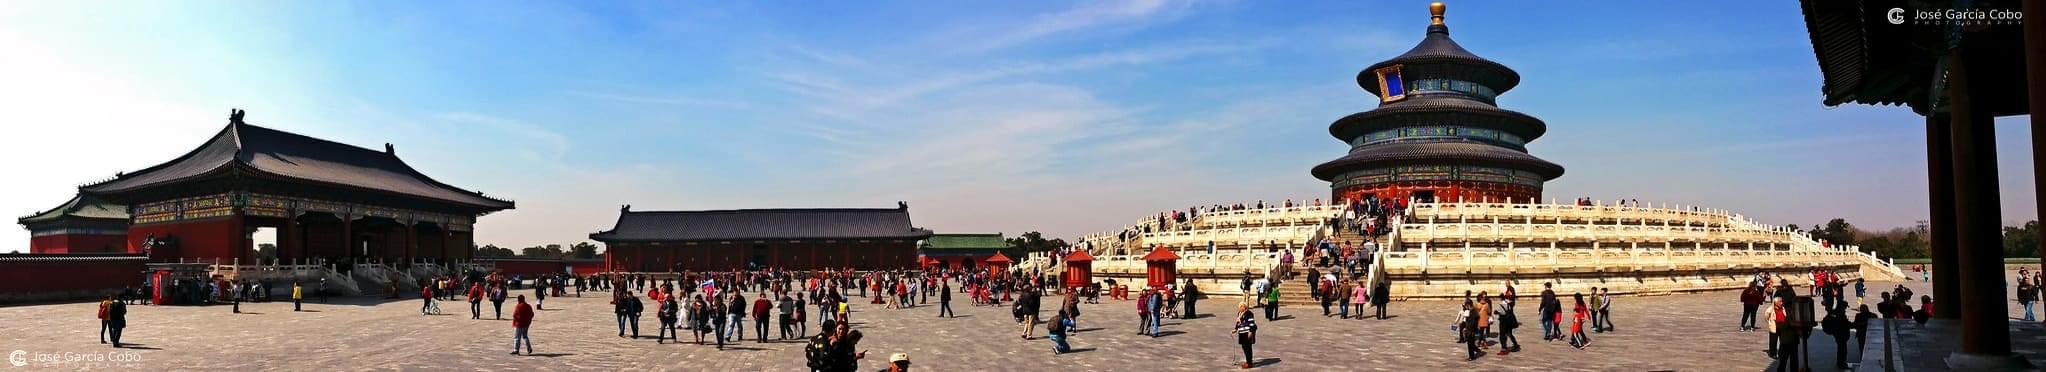 Пекин short <br> Пекин <br>